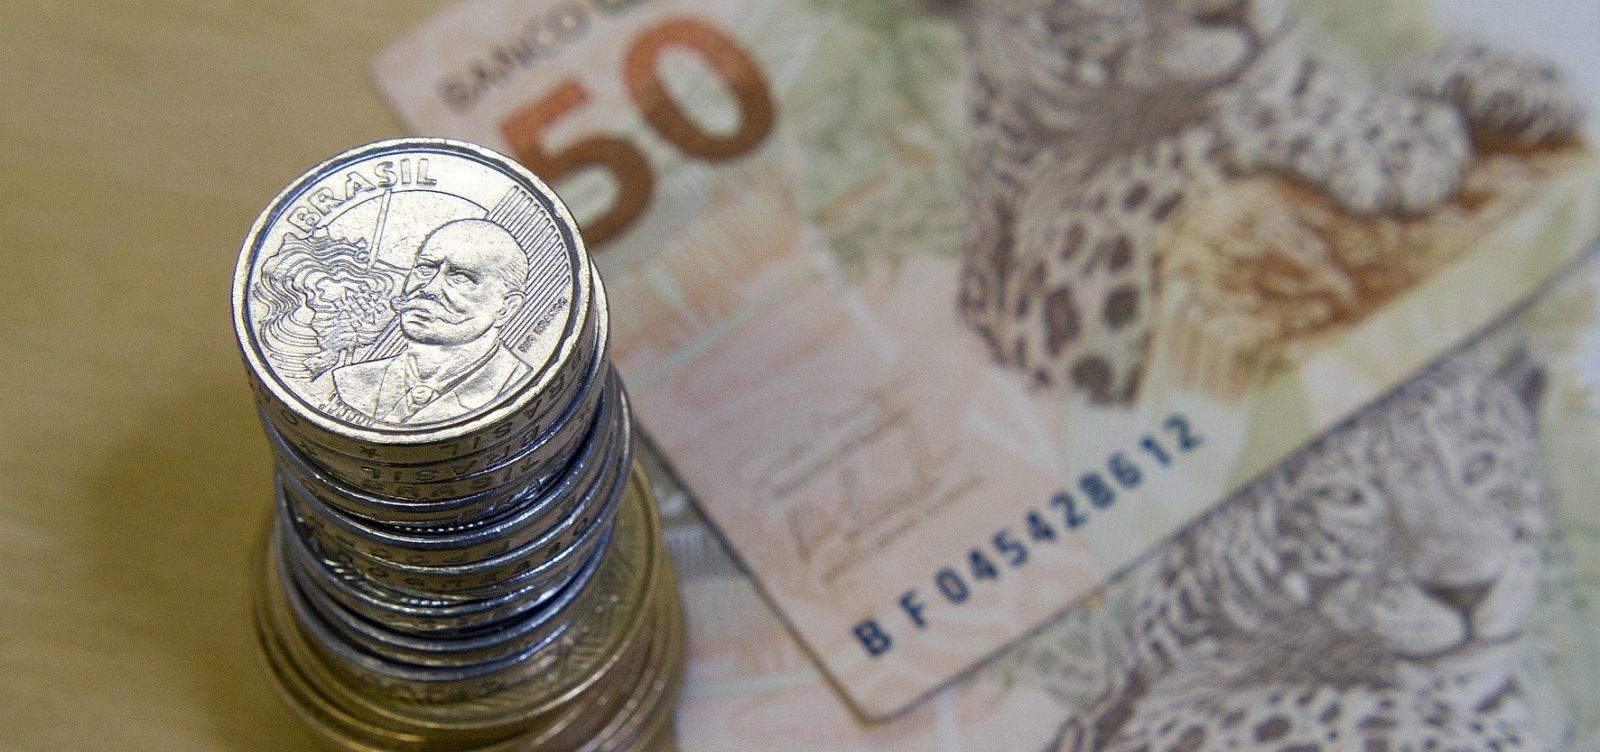 Bahia deixa topo do ranking da desigualdade salarial no país, diz IBGE